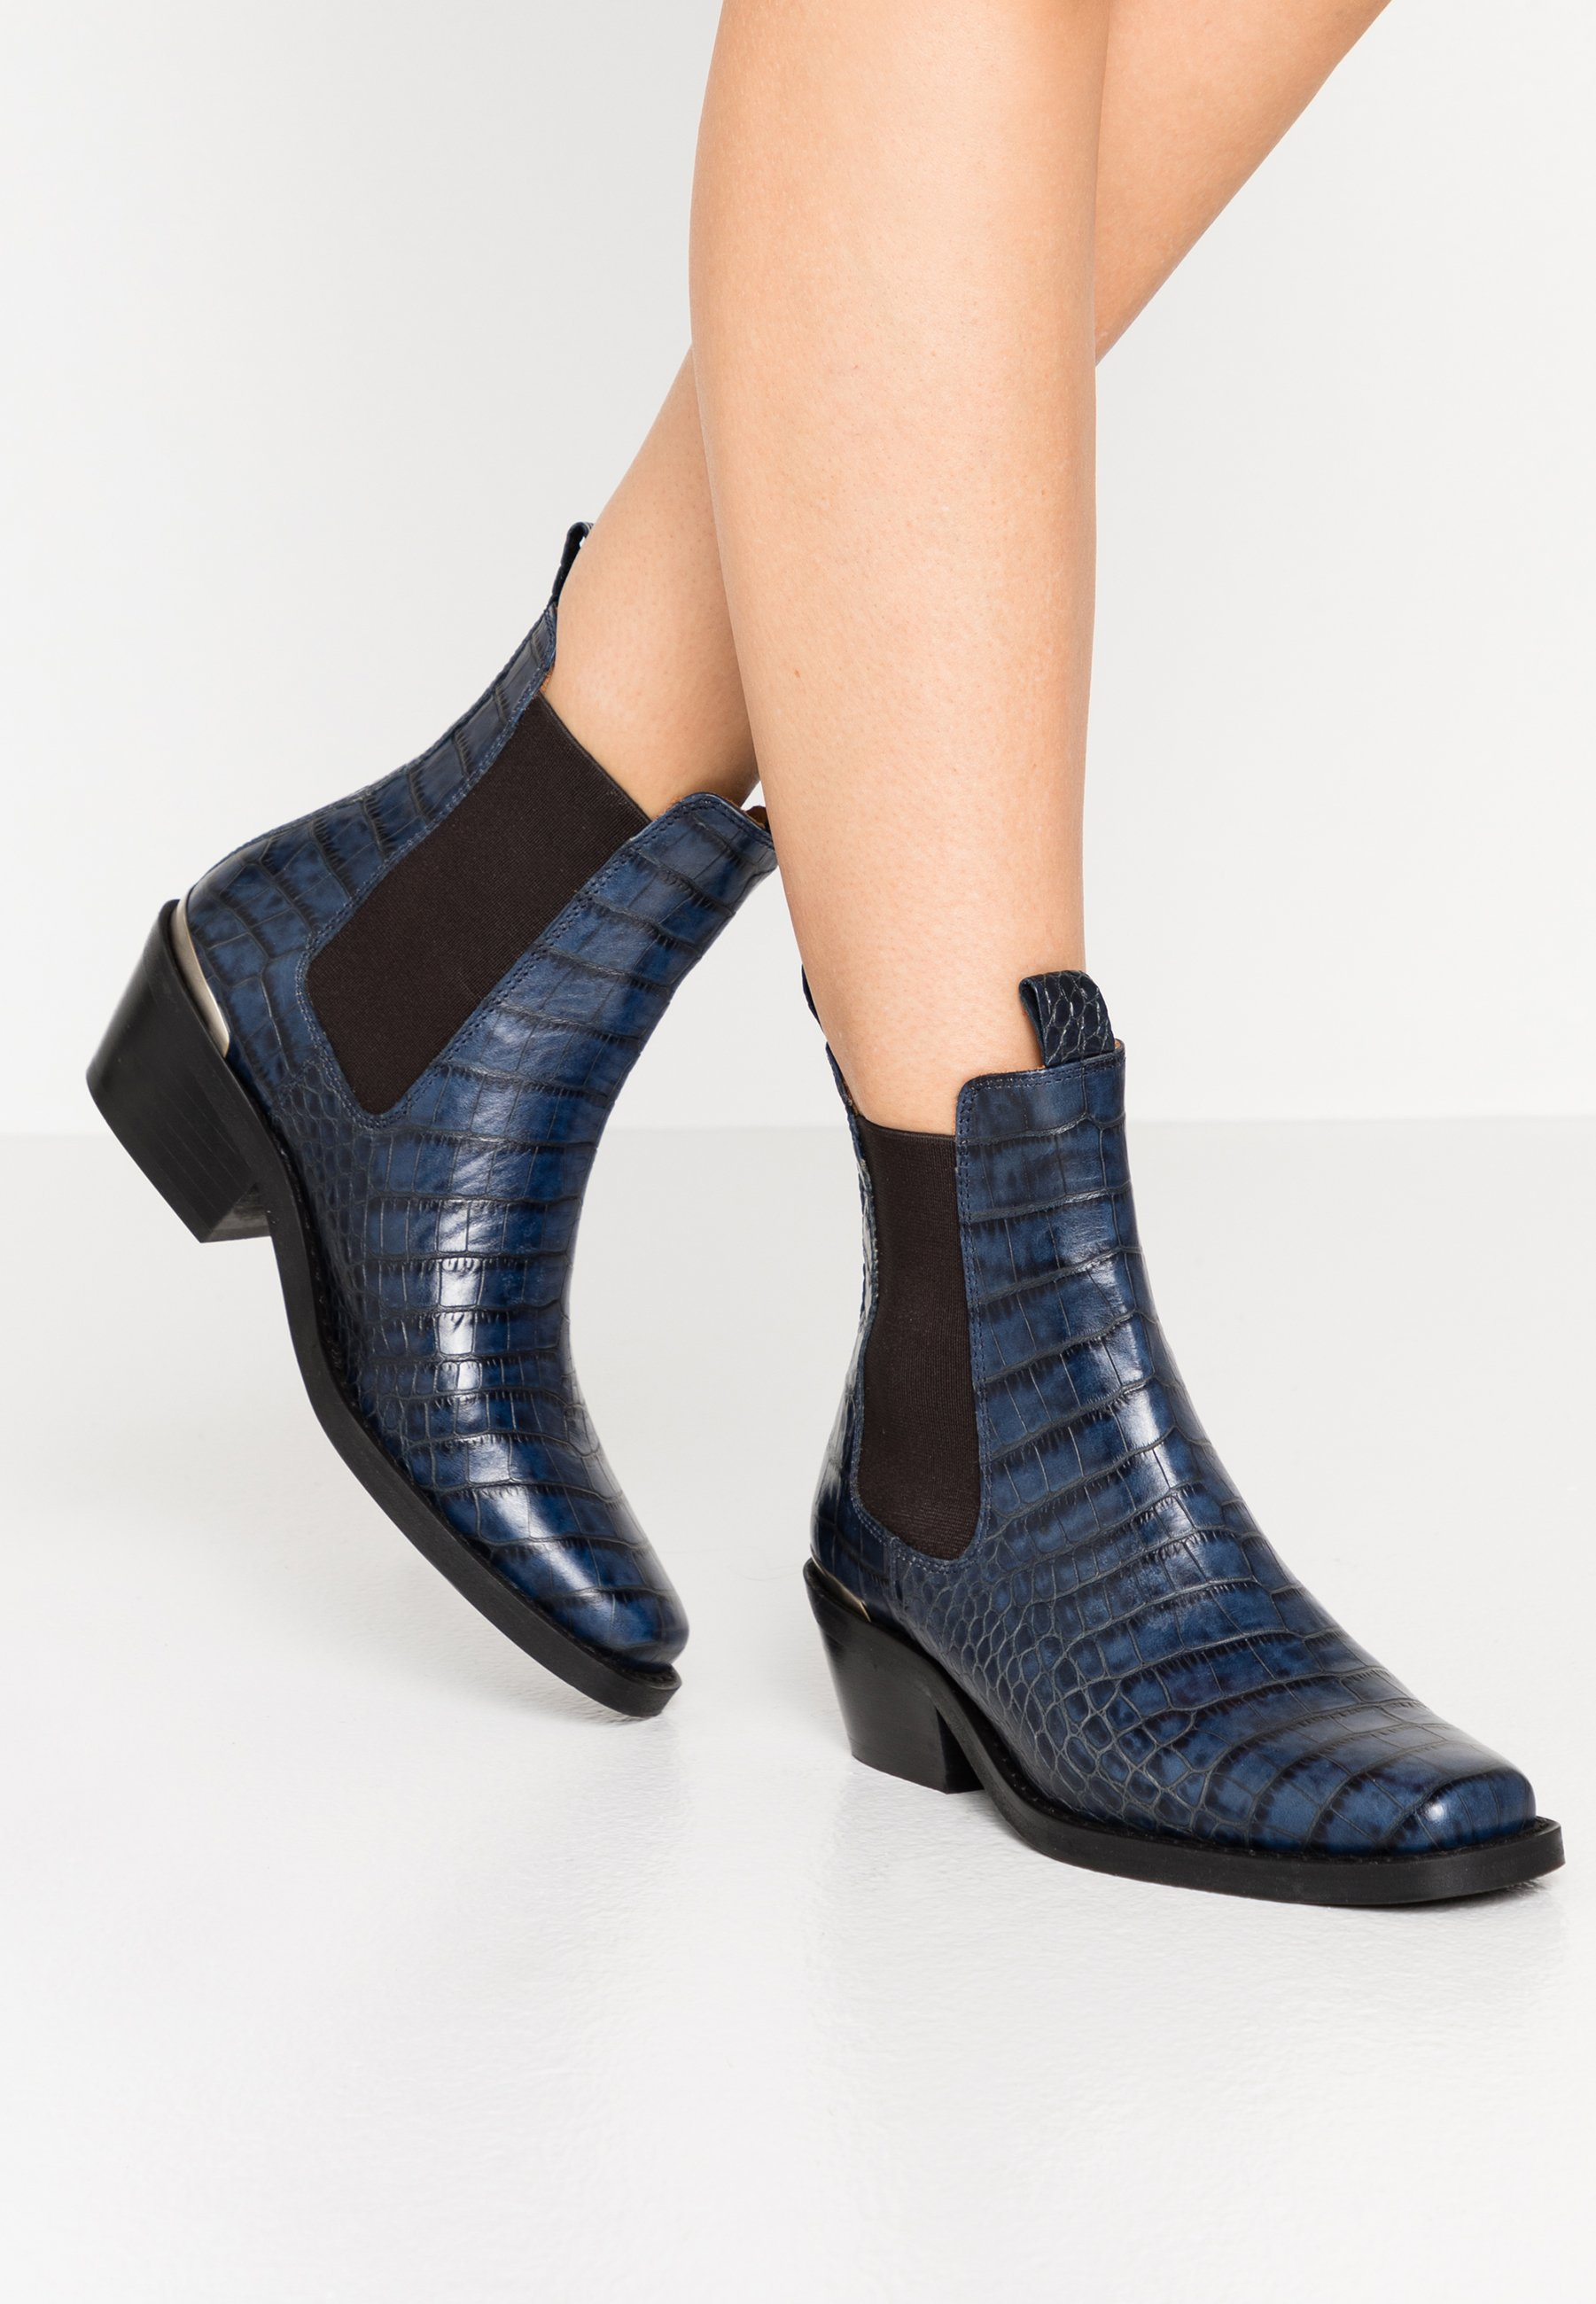 Billi Bi Bottines - blue luisiana - Bottines Femme Qualité